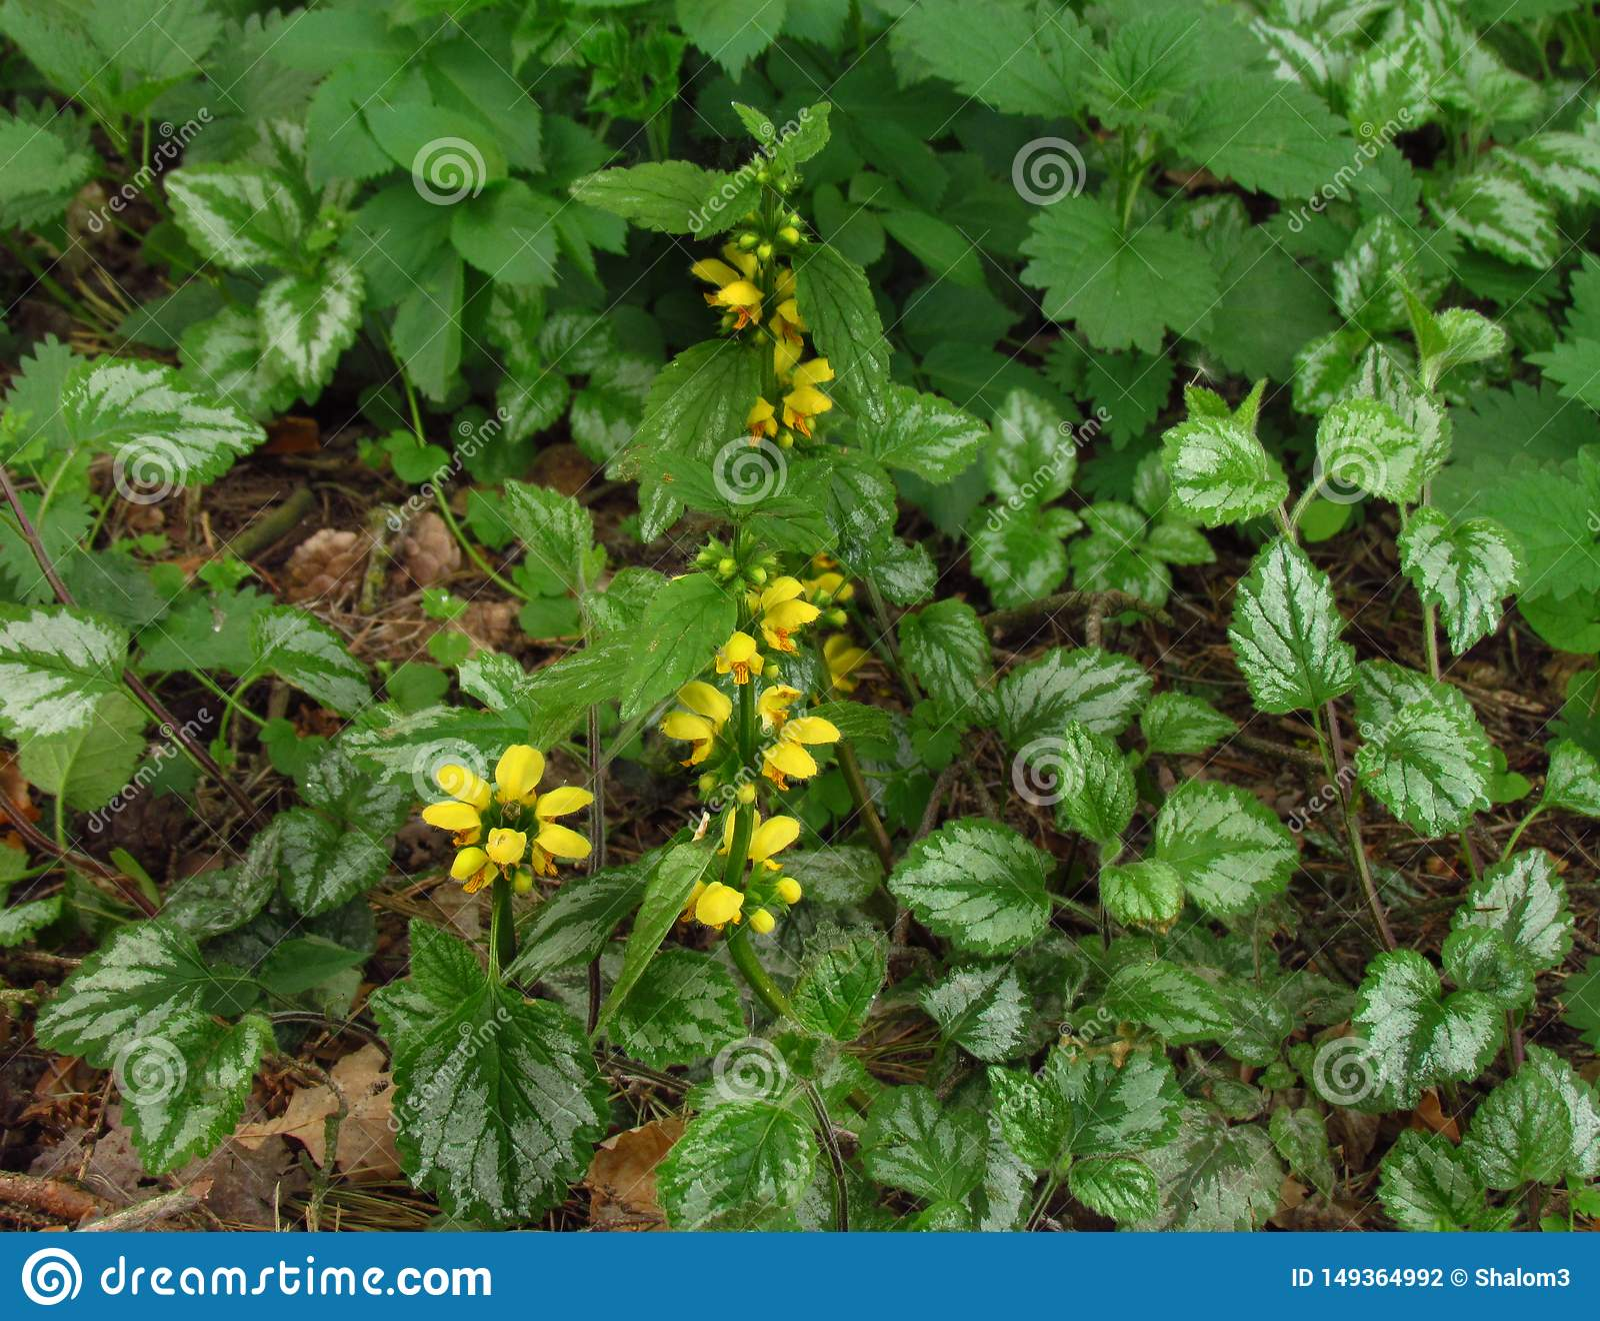 Lamiastrum galeobdolon other name Galeobdolon luteum, perennial yellow flowering herb